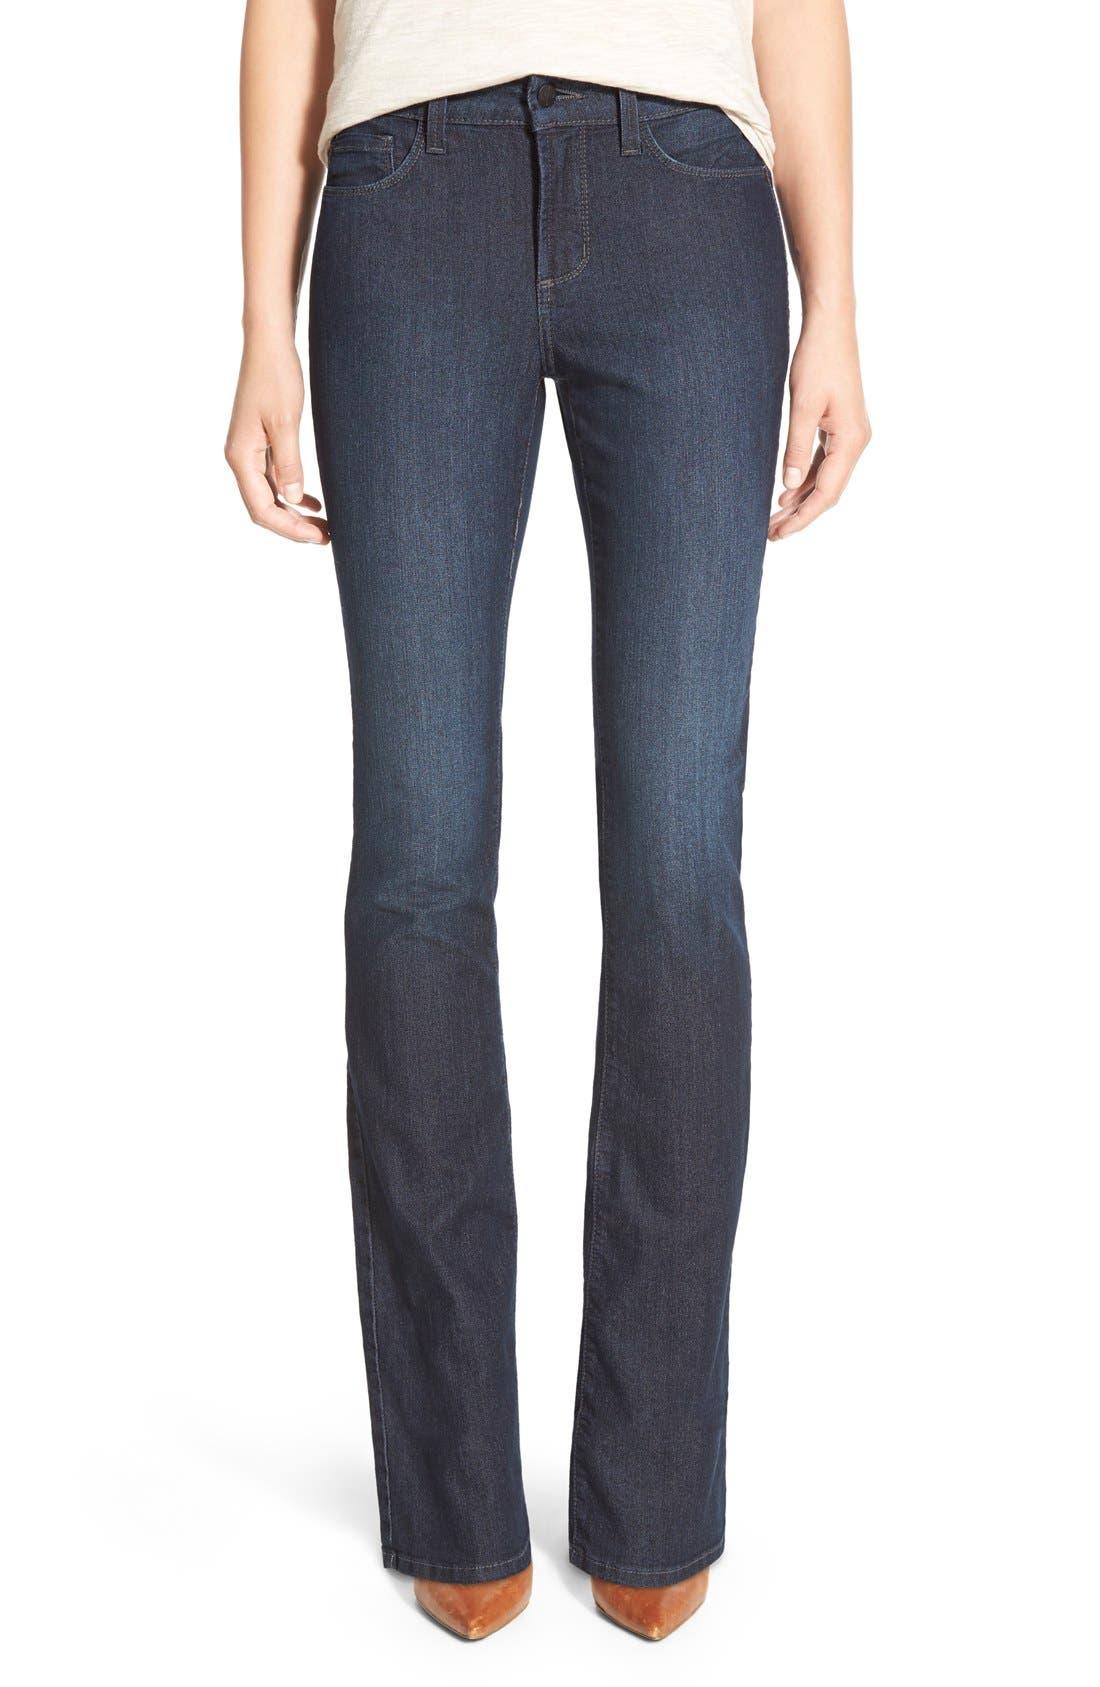 Main Image - NYDJ 'Billie' Stretch Mini Bootcut Jeans (Burbank)